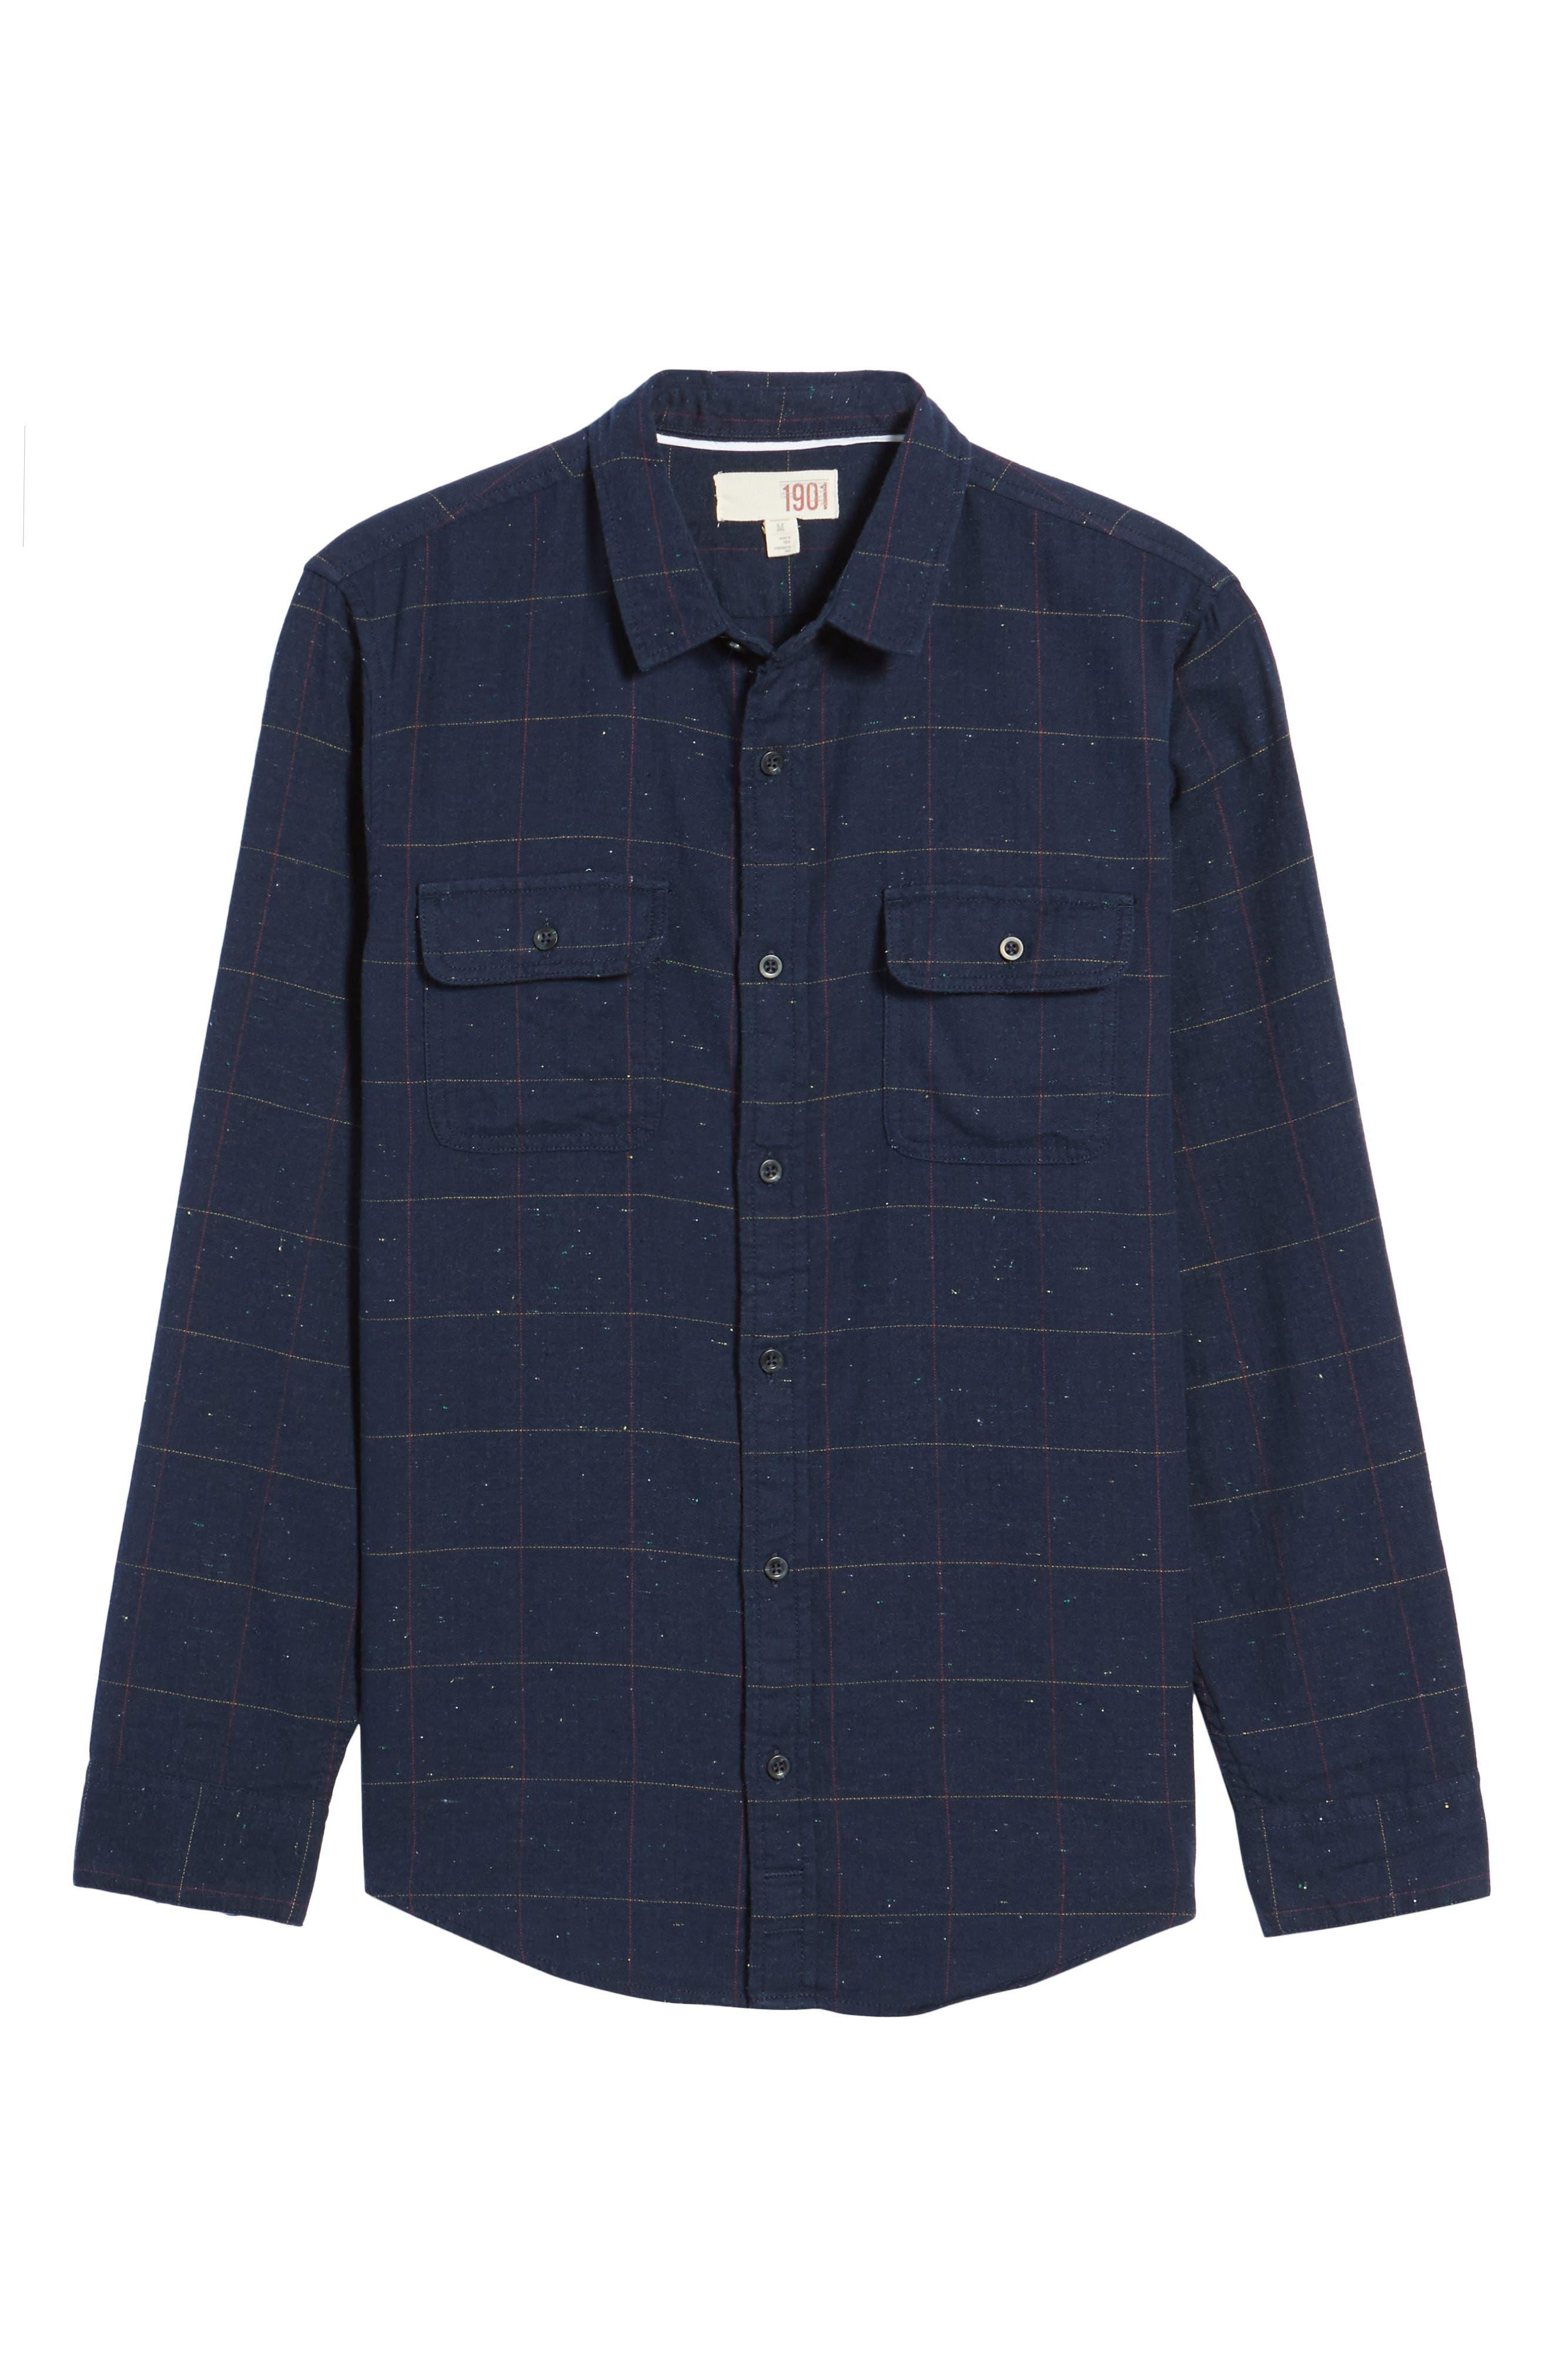 Herringbone Plaid Flannel Shirt,                             Alternate thumbnail 6, color,                             Black - White Nepped Tartan